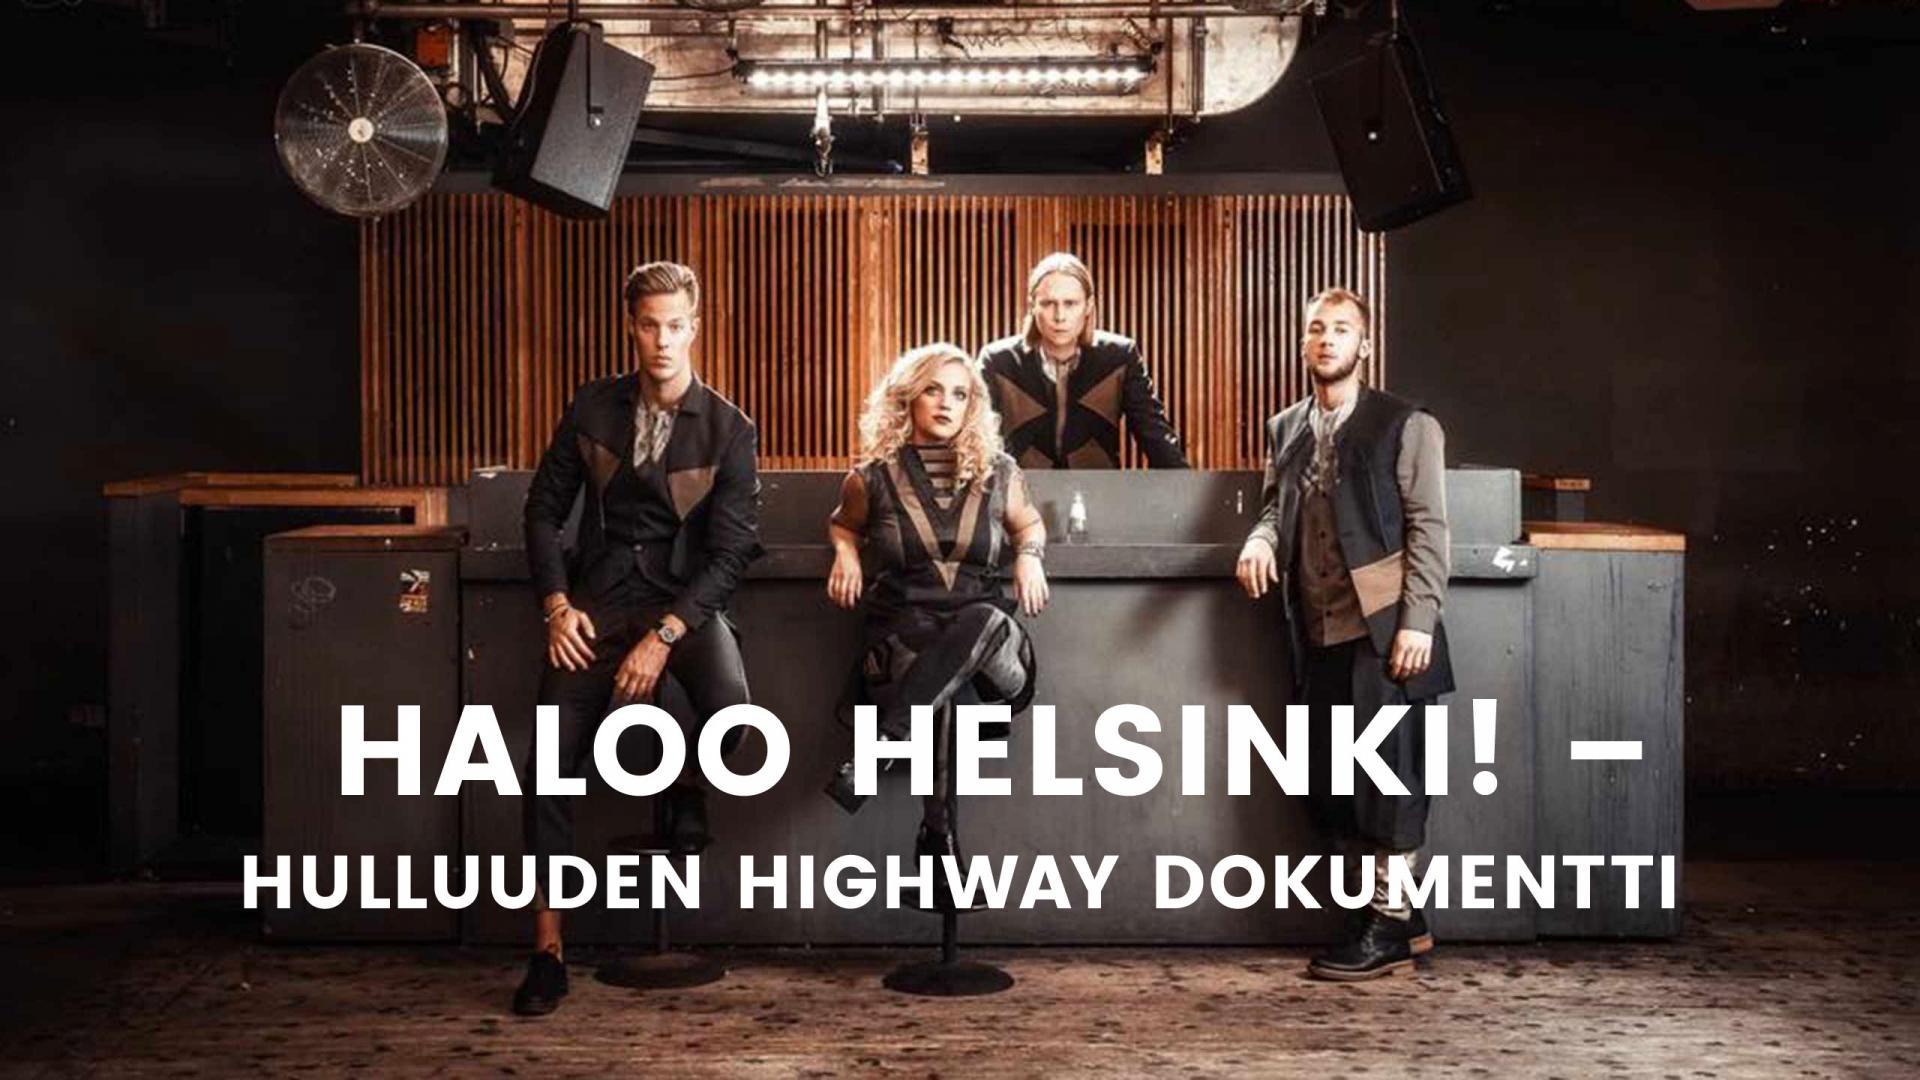 Haloo Helsinki Hulluuden Highway